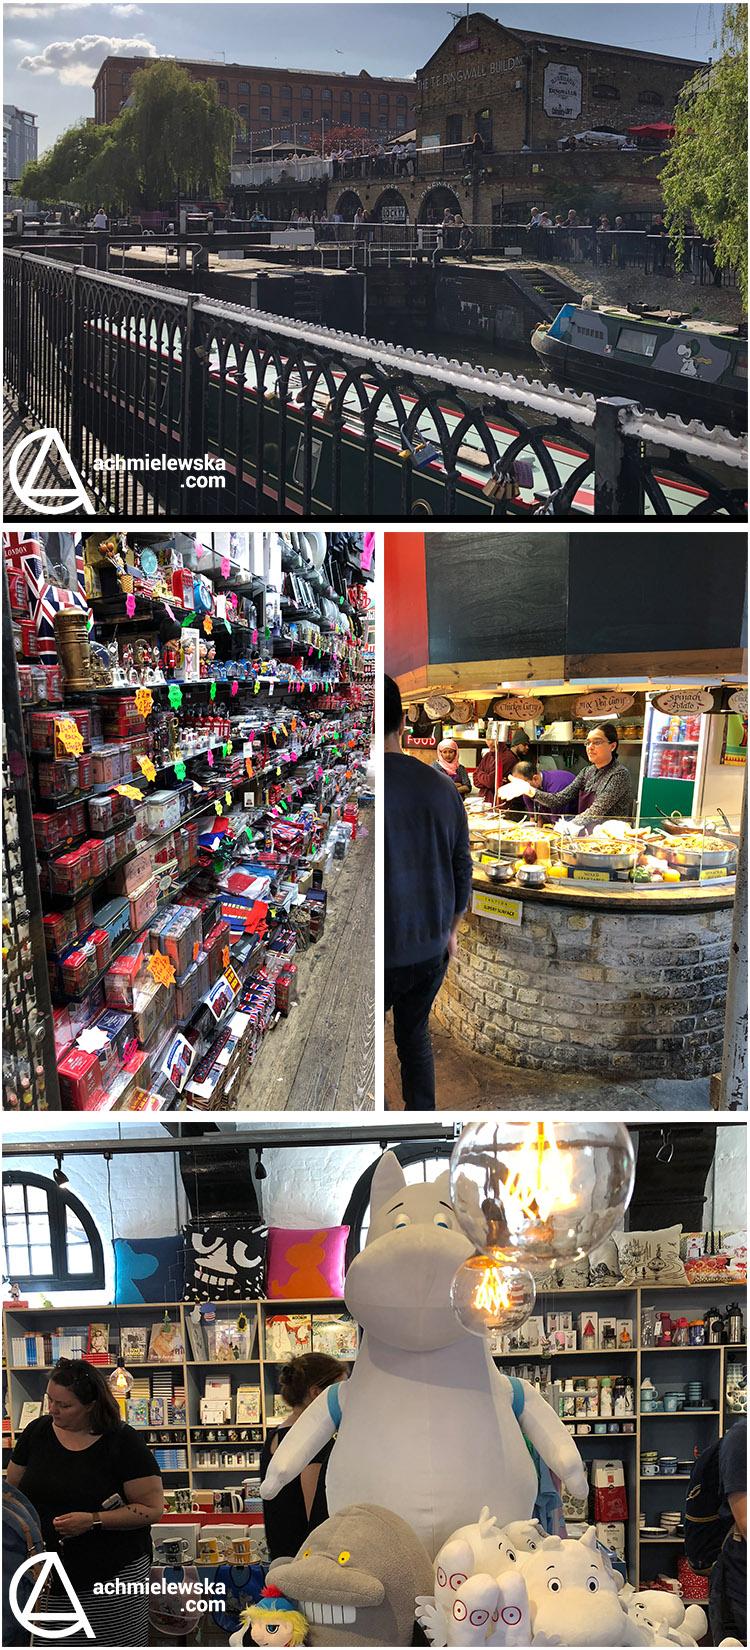 camden market town